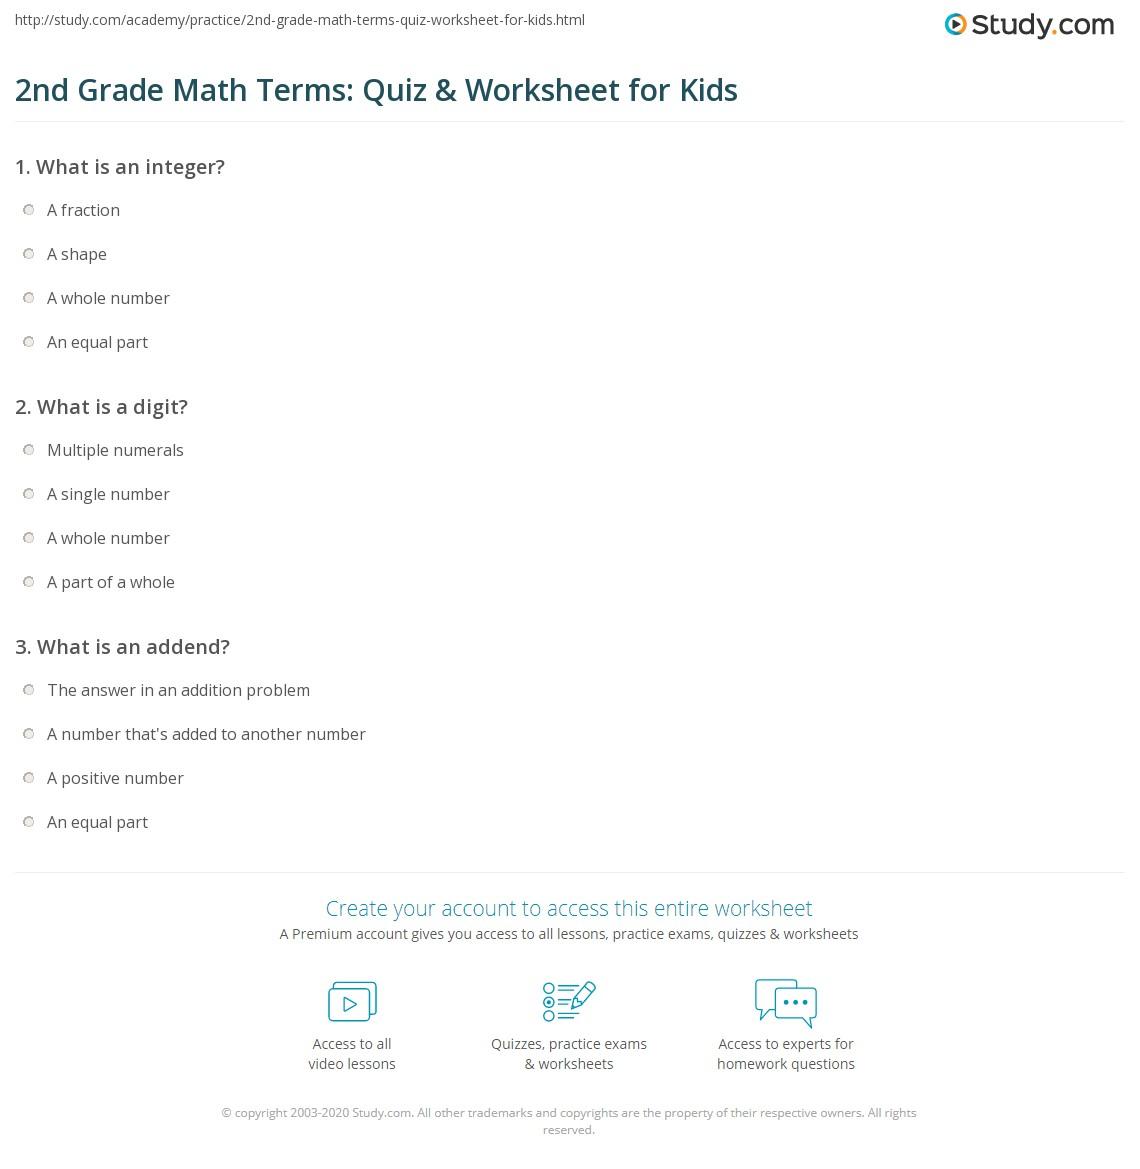 2nd Grade Math Terms Quiz Amp Worksheet For Kids